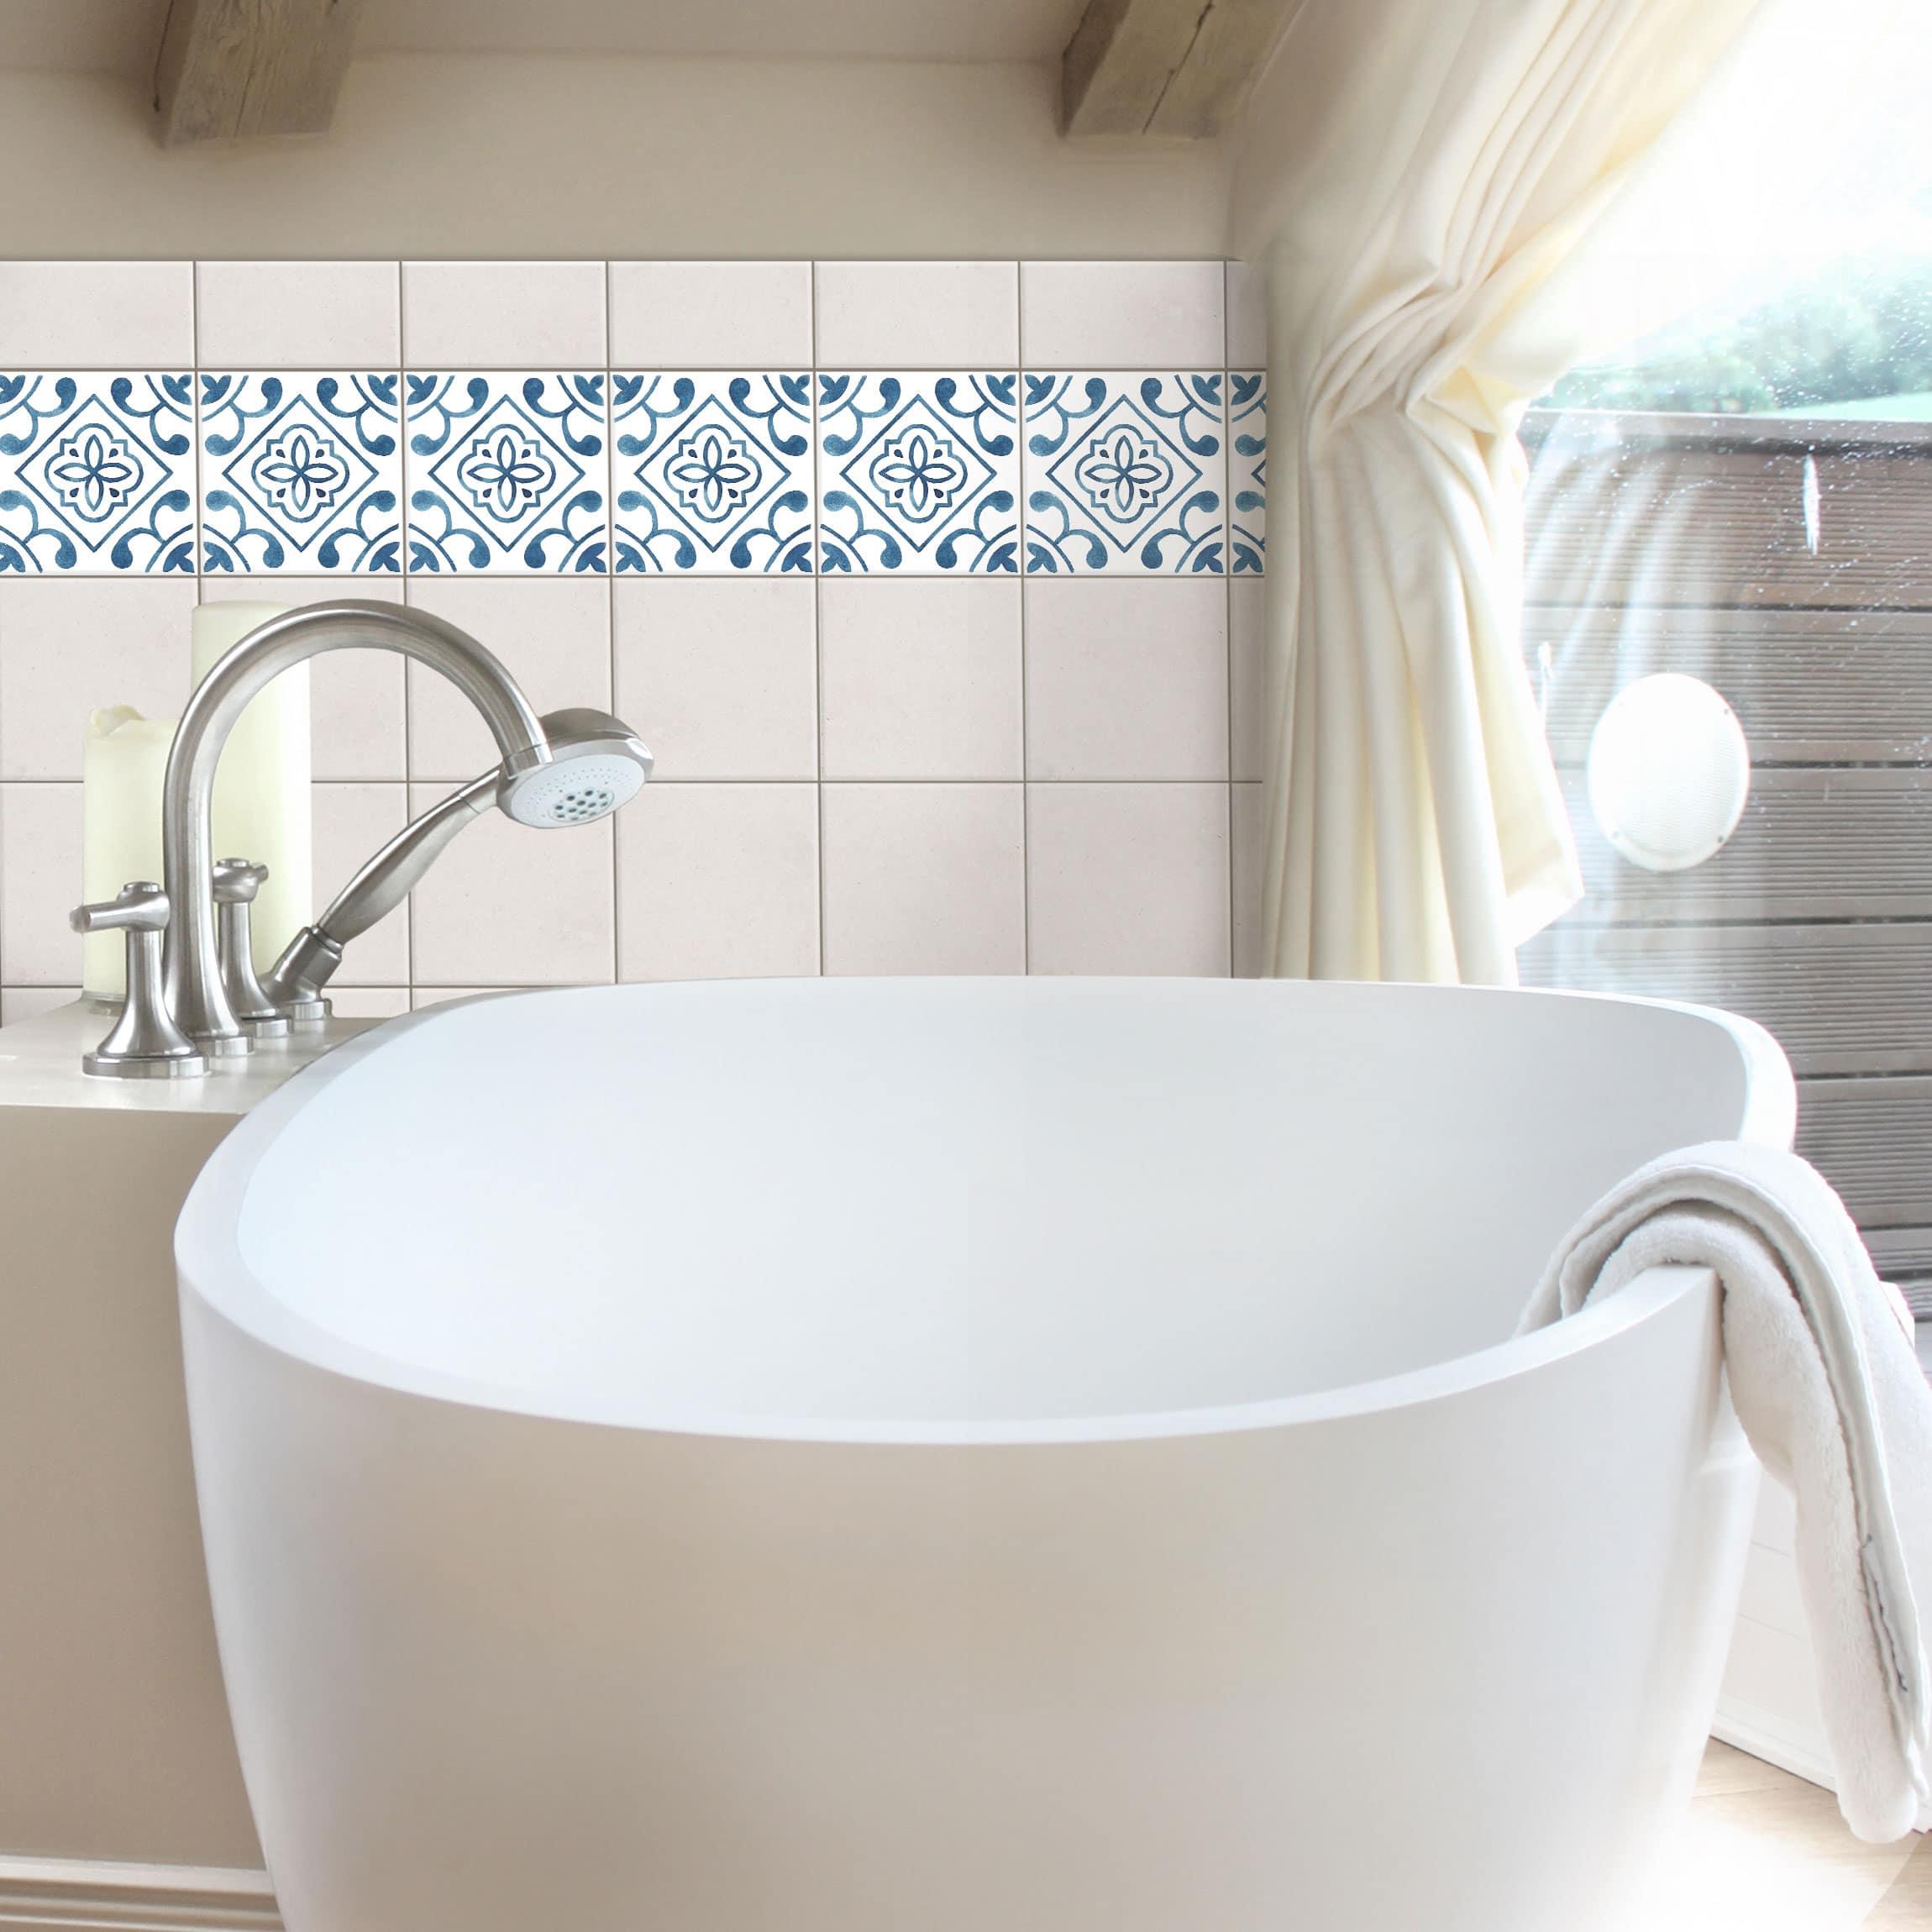 fliesen bord re muster blau wei serie no 2 1 1 quadrat. Black Bedroom Furniture Sets. Home Design Ideas